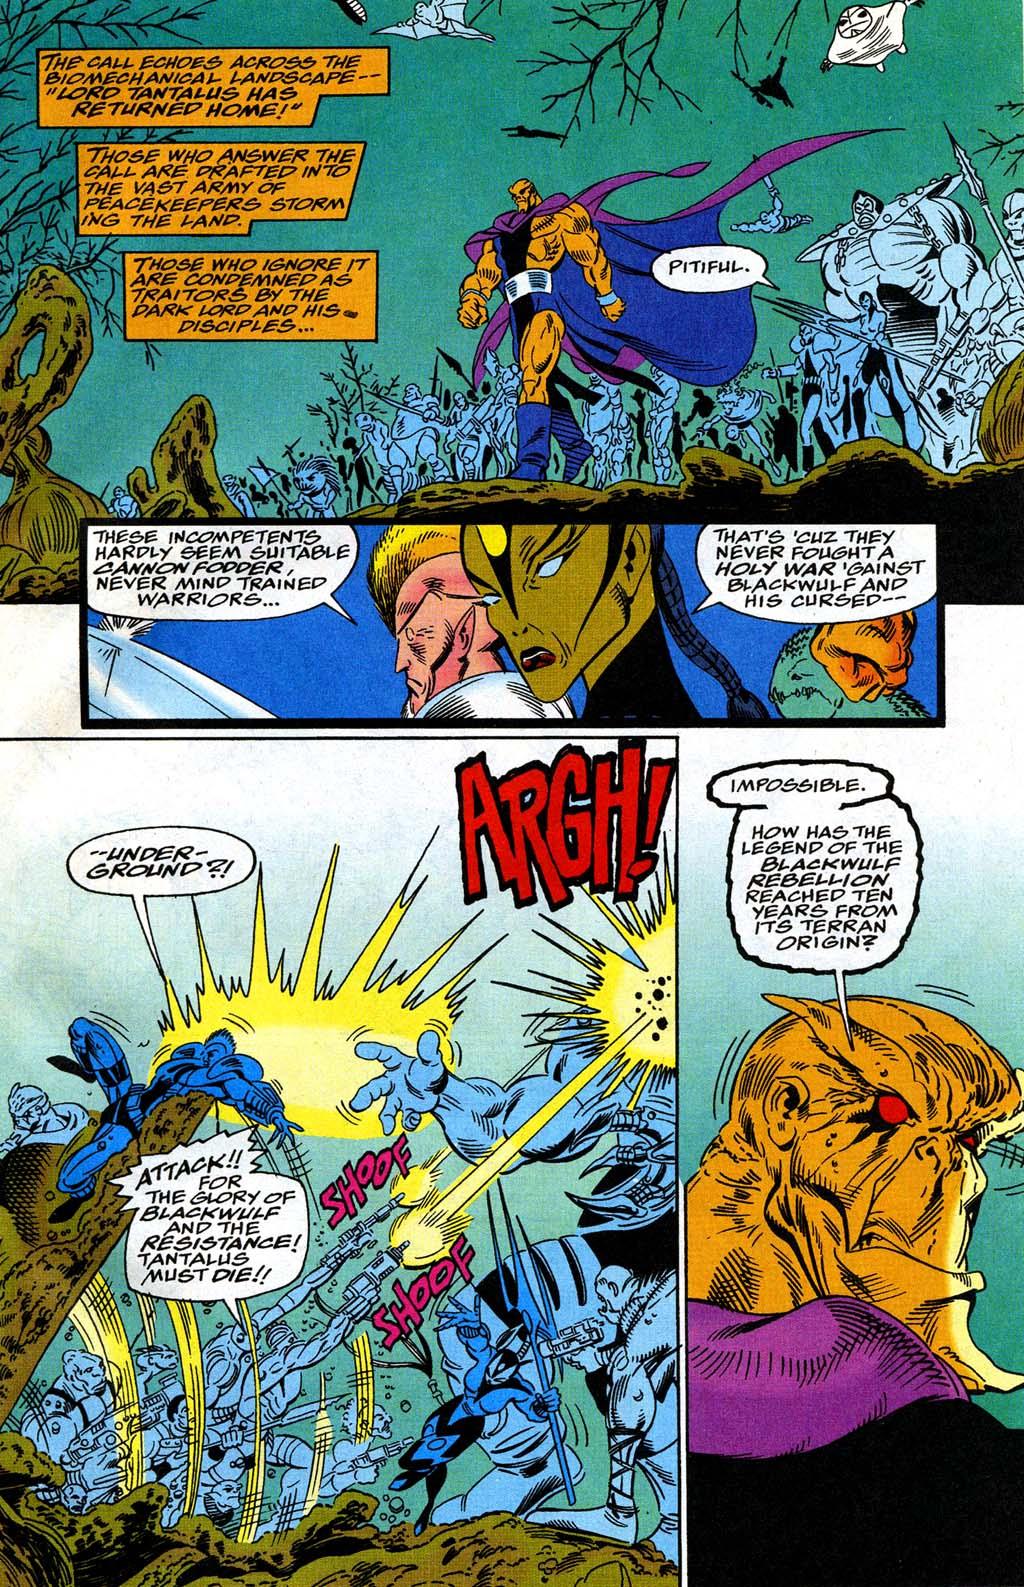 Read online Blackwulf comic -  Issue #8 - 13